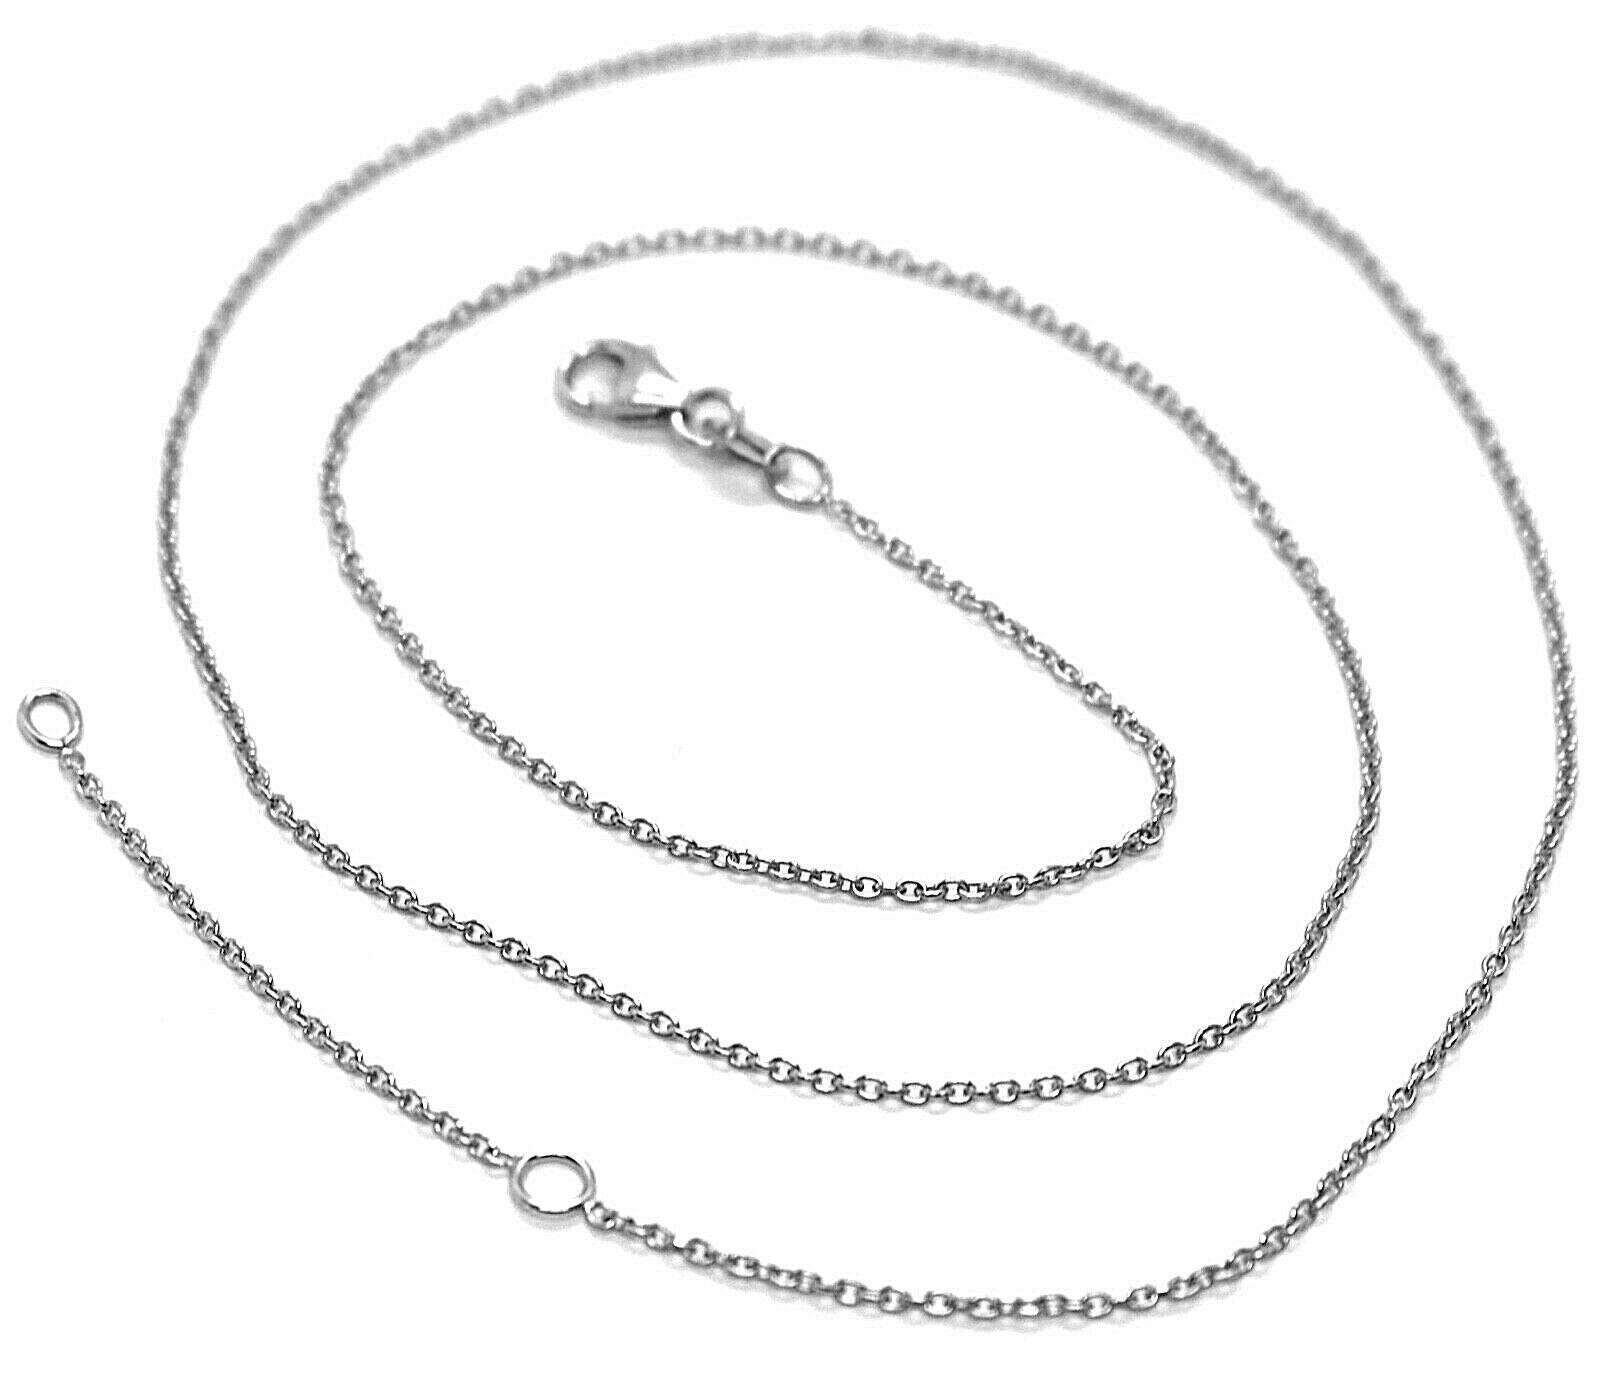 MINI GOLD CHAIN WHITE 750 18K, 40 45 0,5 50 CM, JERSEY ROLO', CIRCLES DIAM. 1 MM